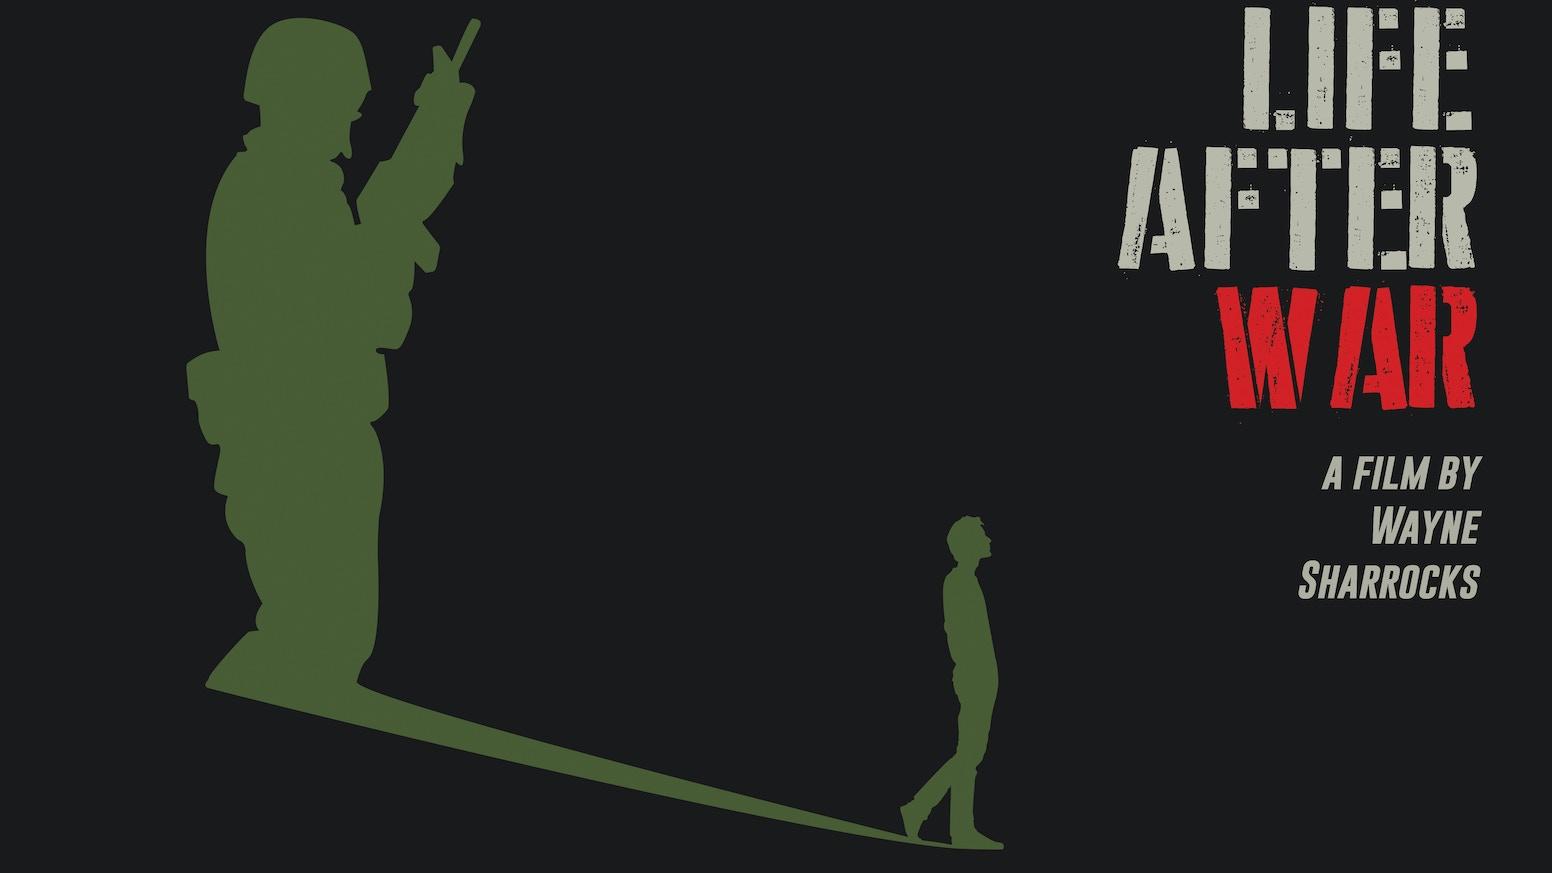 A documentary film highlighting the struggles of veterans.